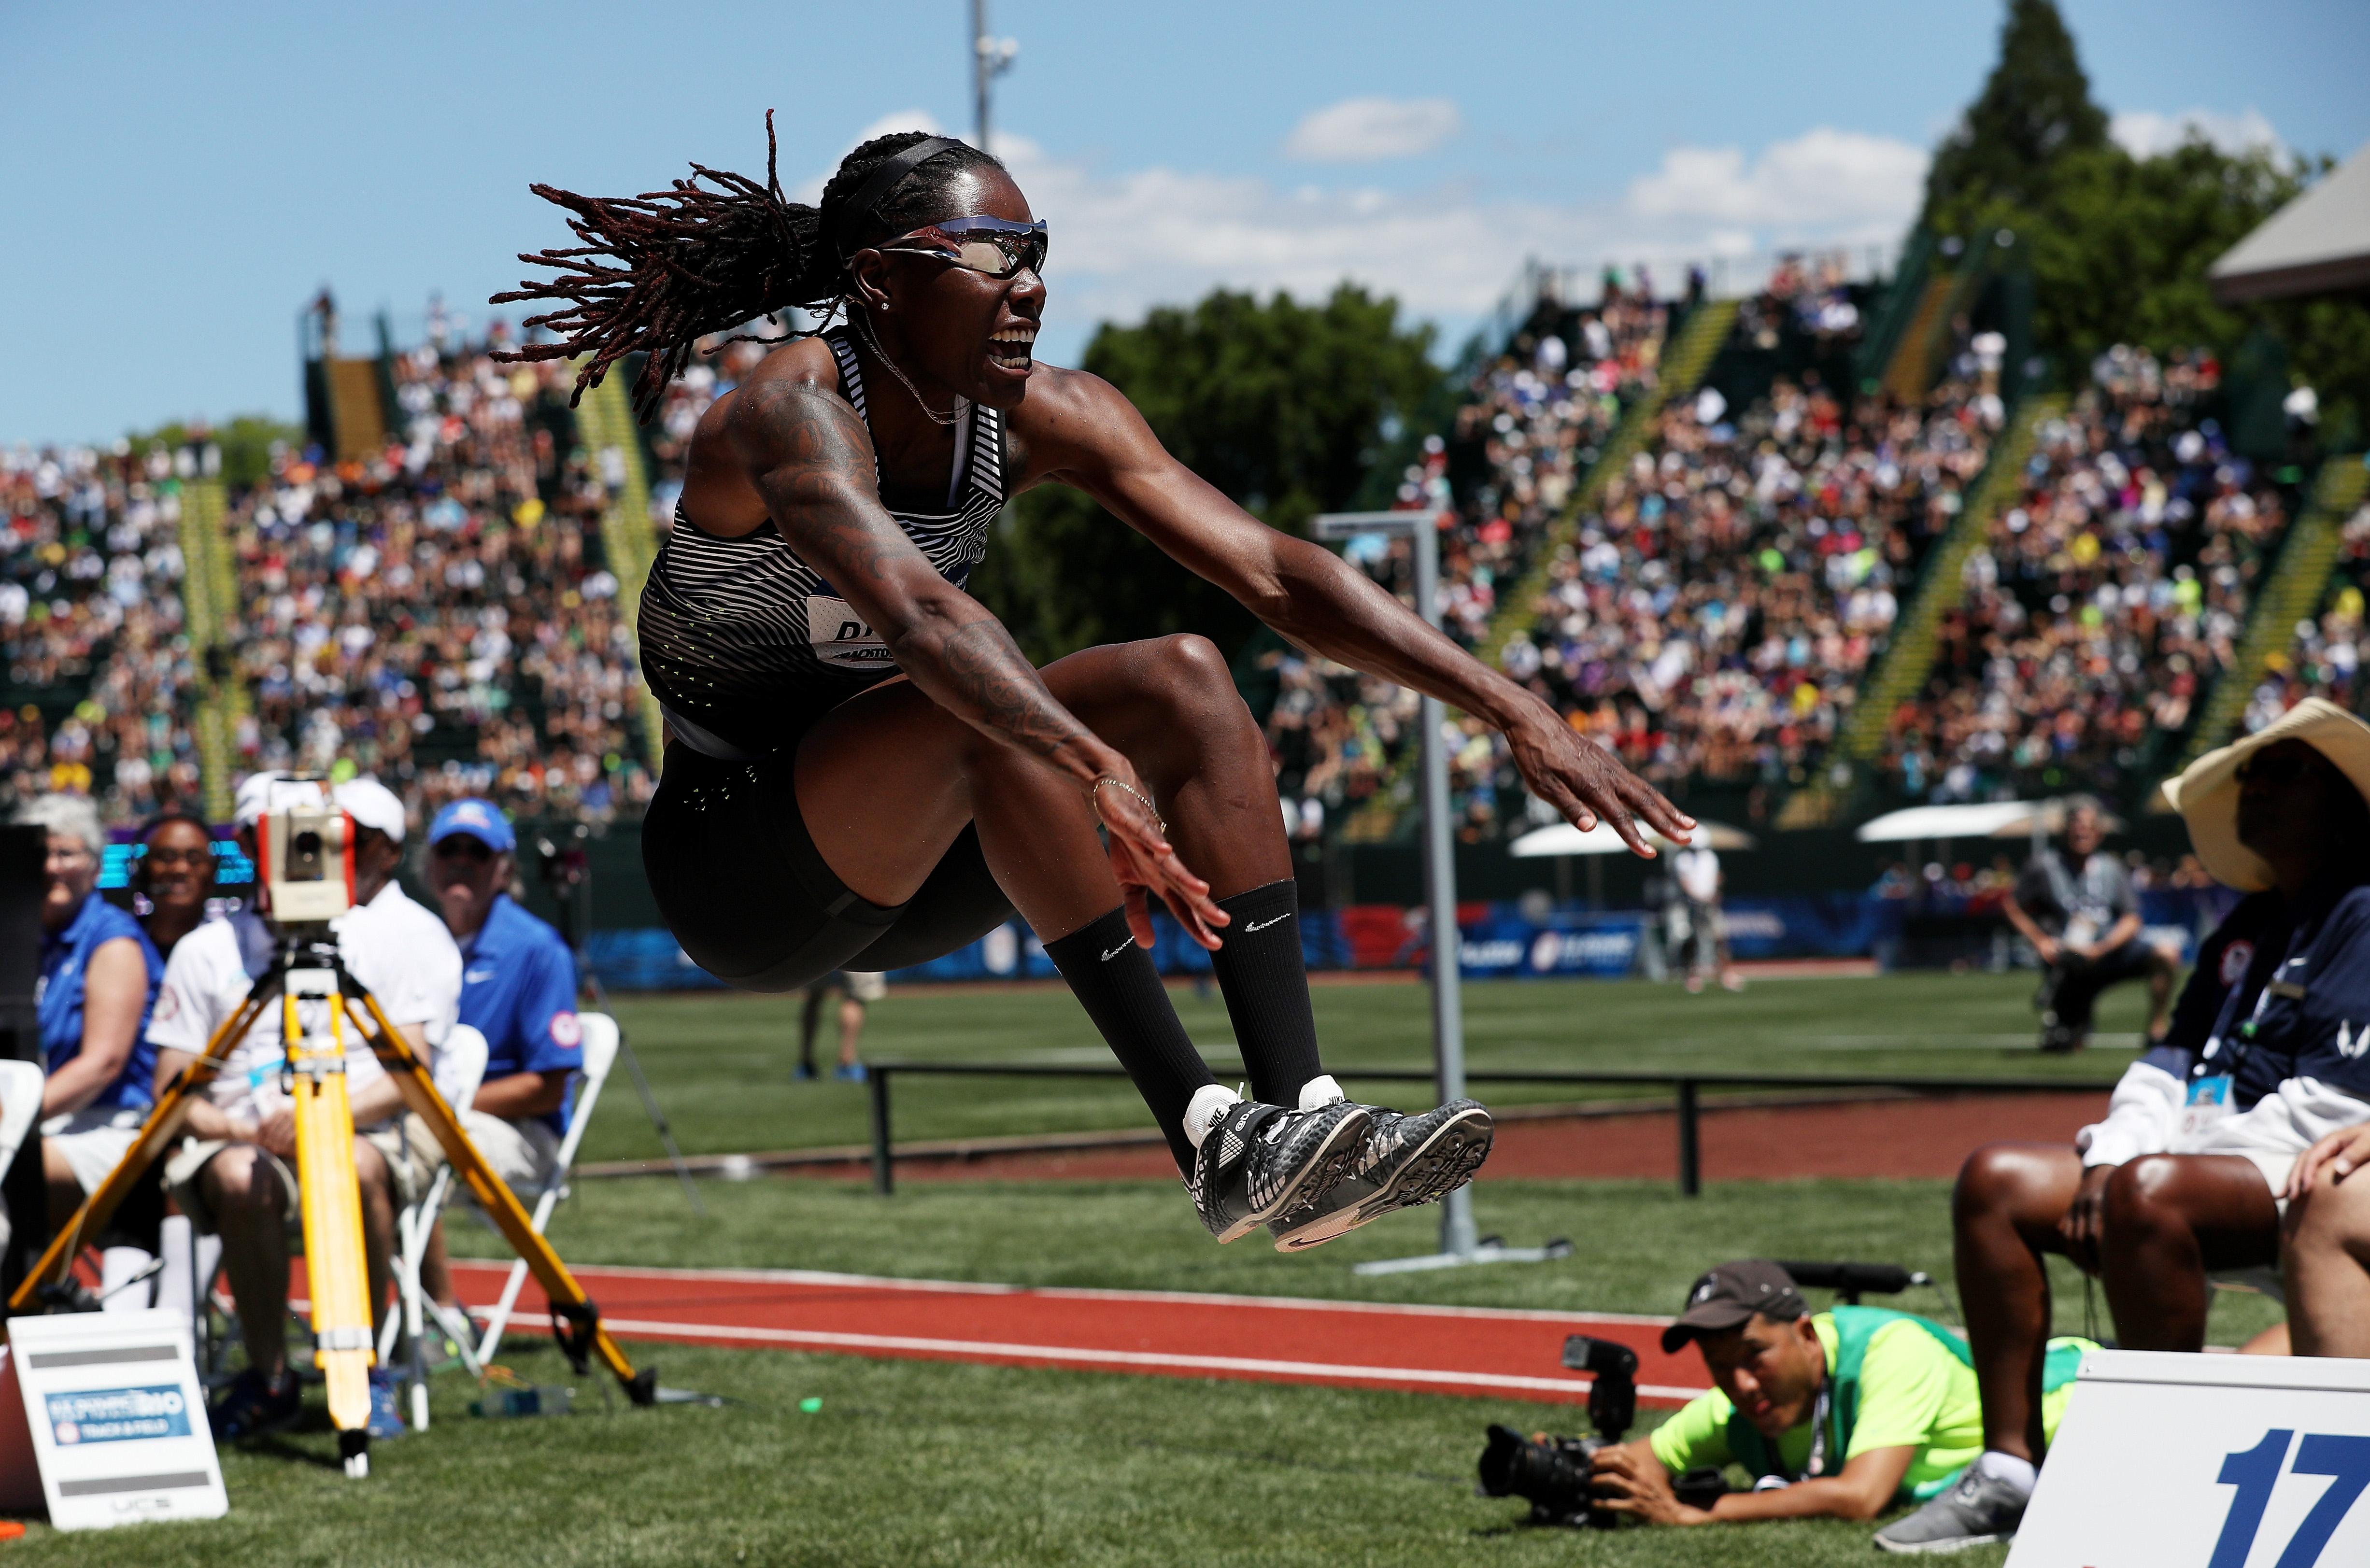 2016 U.S. Olympic Track & Field Team Trials – Day 2